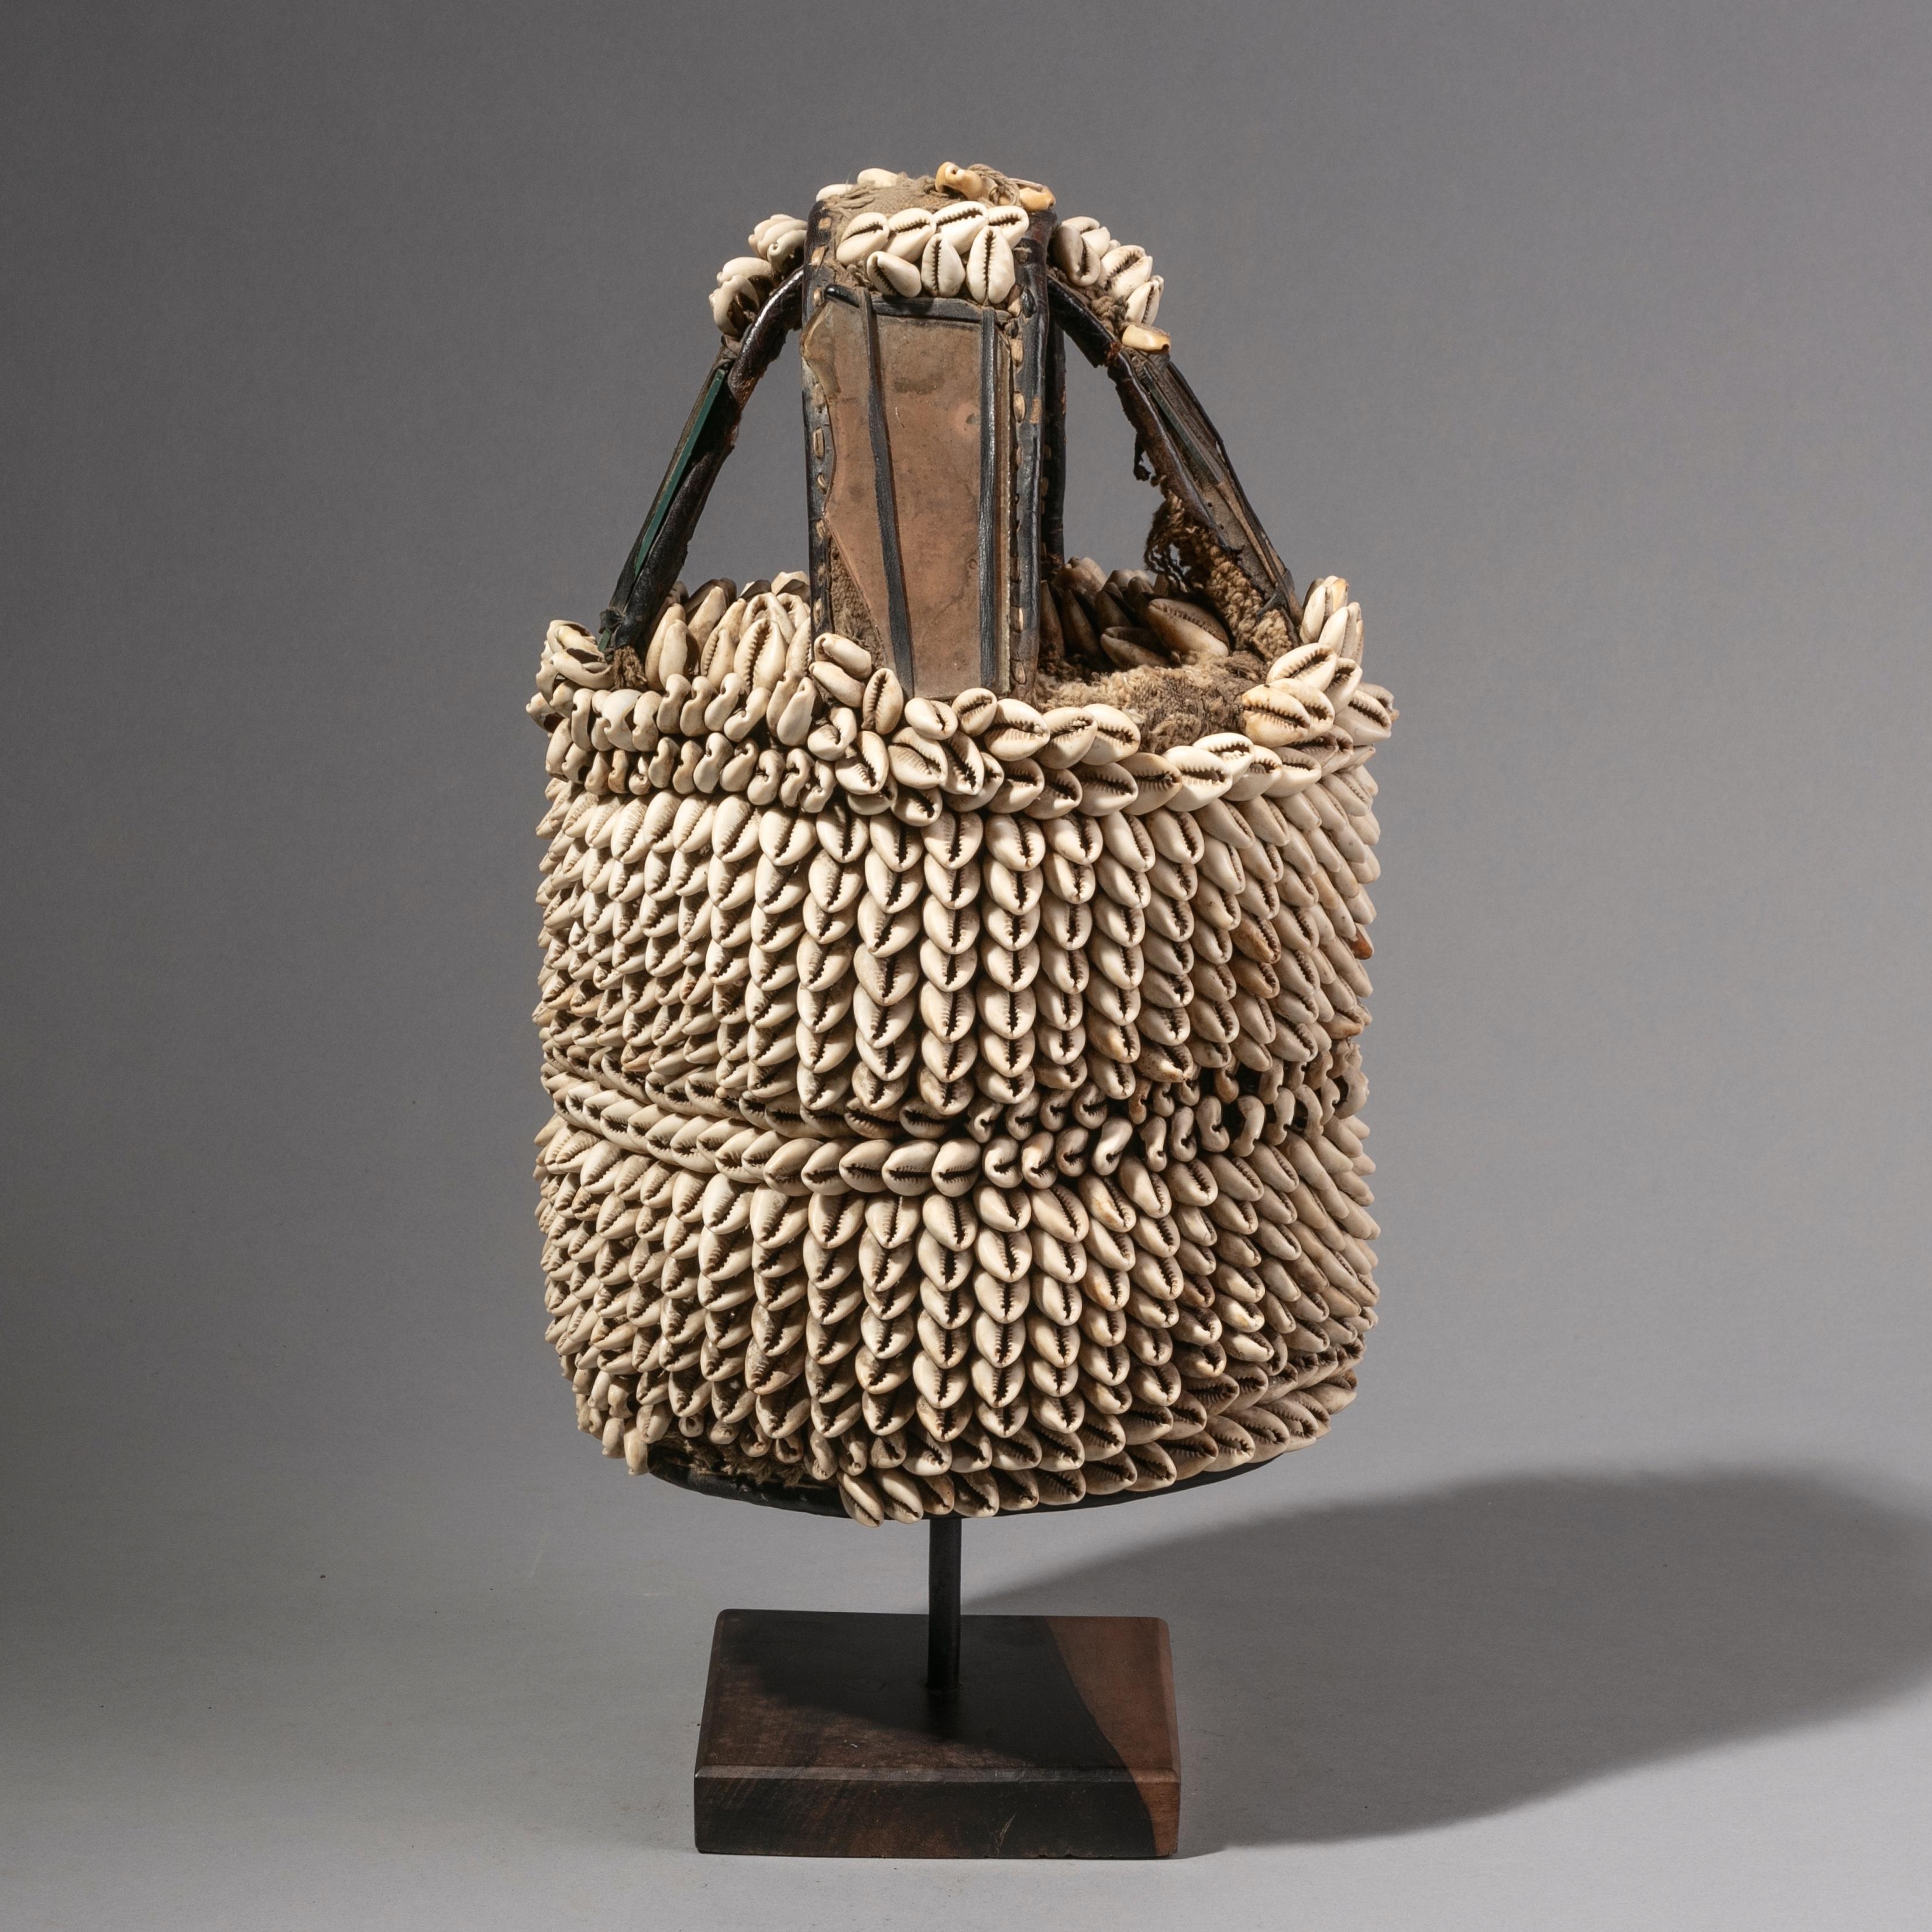 SD ( SPECIAL DEAL ) A COWRIE SHELL DENSE HOUSE OF THE HEAD, YORUBA TRIBE NIGERIA ( No 1204 )